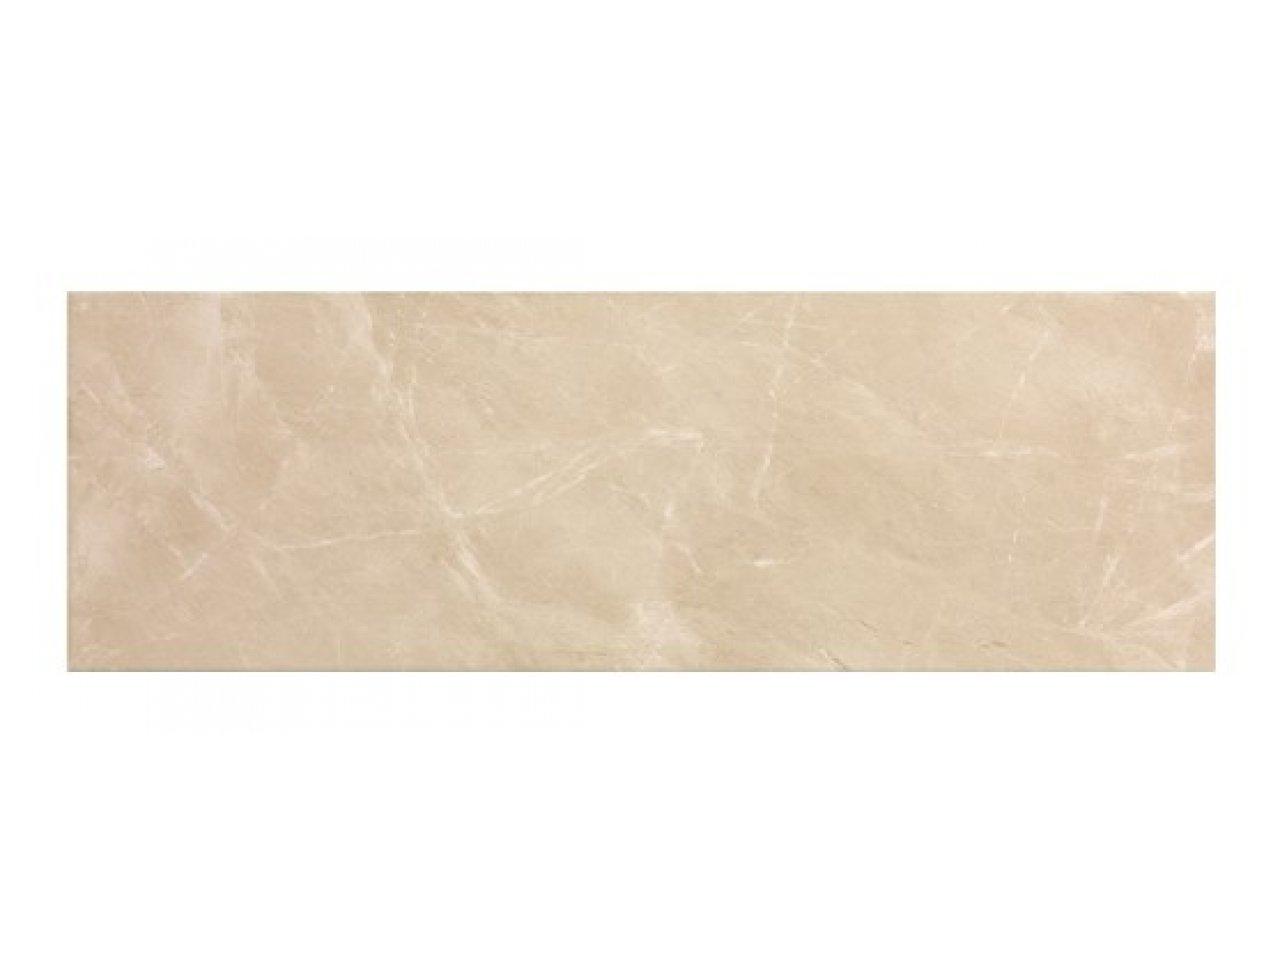 Настенная плитка FAP Roma Diamond Beige Duna Brillante 75 x 25 см, Арт. fNHQ